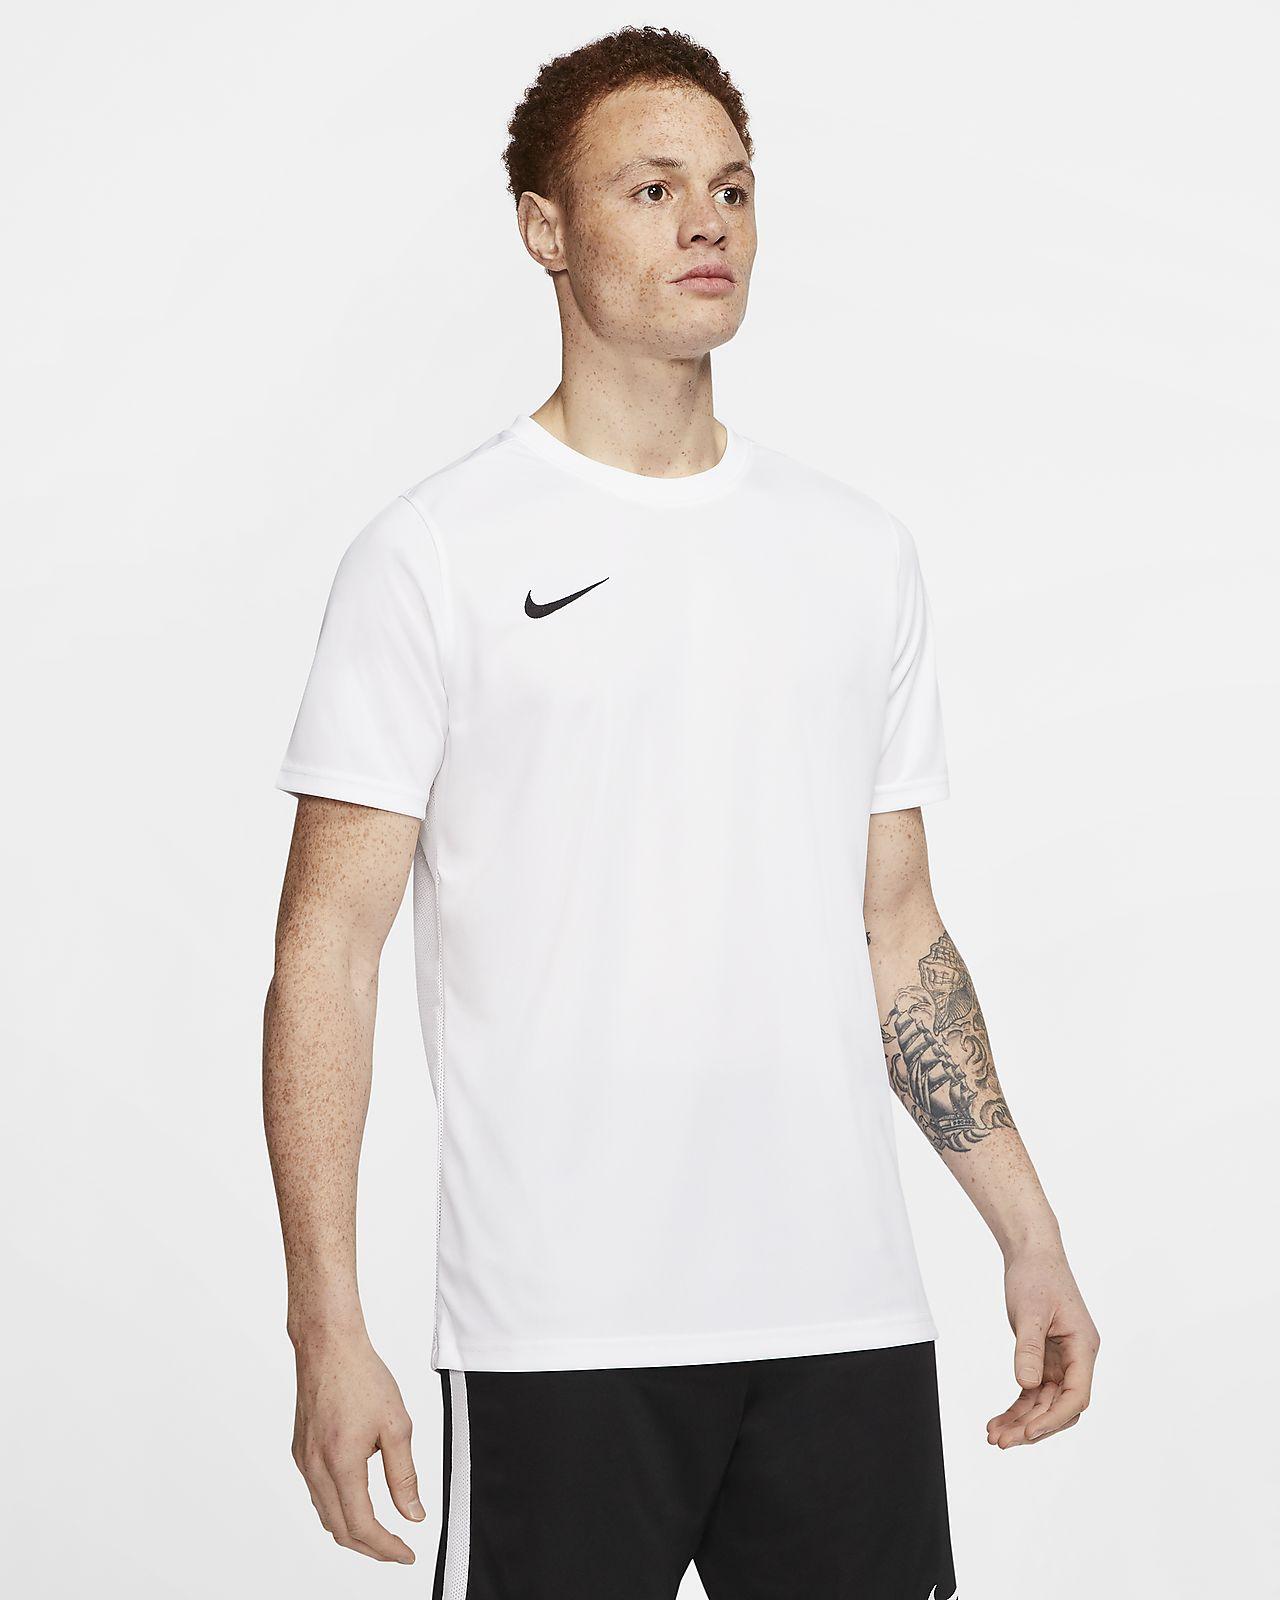 Nike Dri-FIT Park 7 Voetbalshirt voor heren